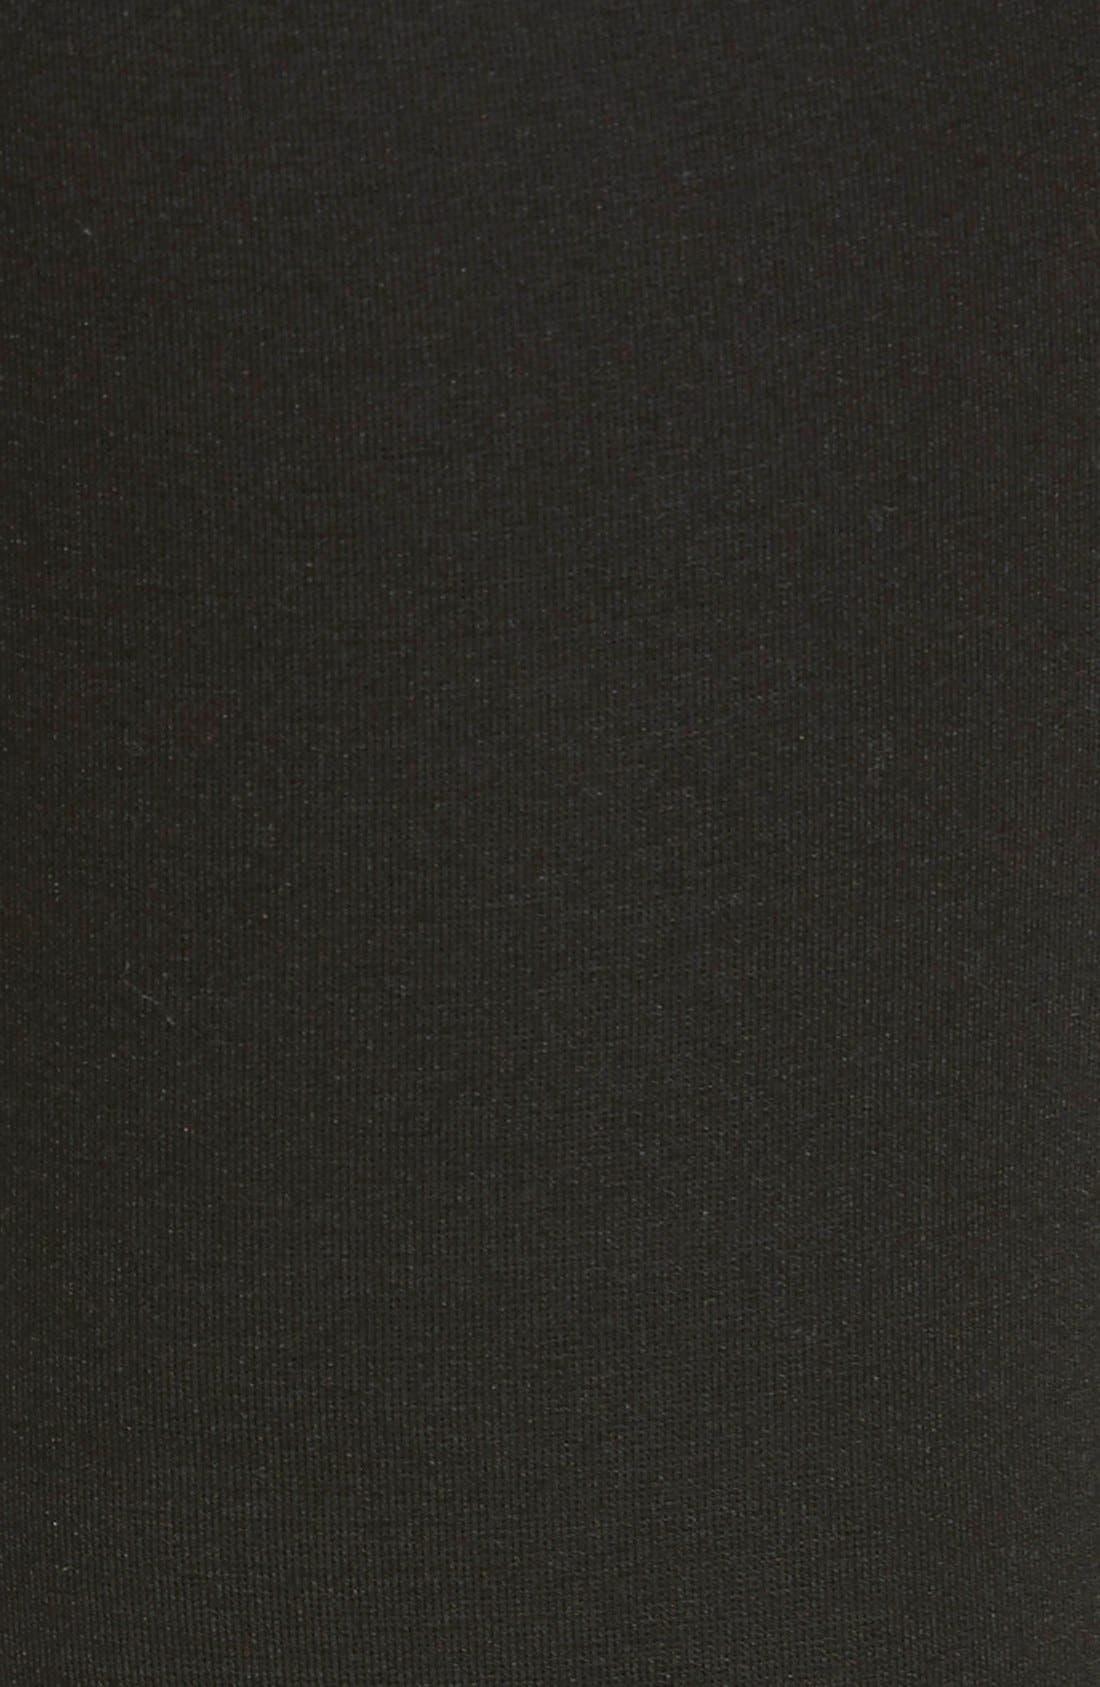 Blackout Leggings,                             Alternate thumbnail 3, color,                             001